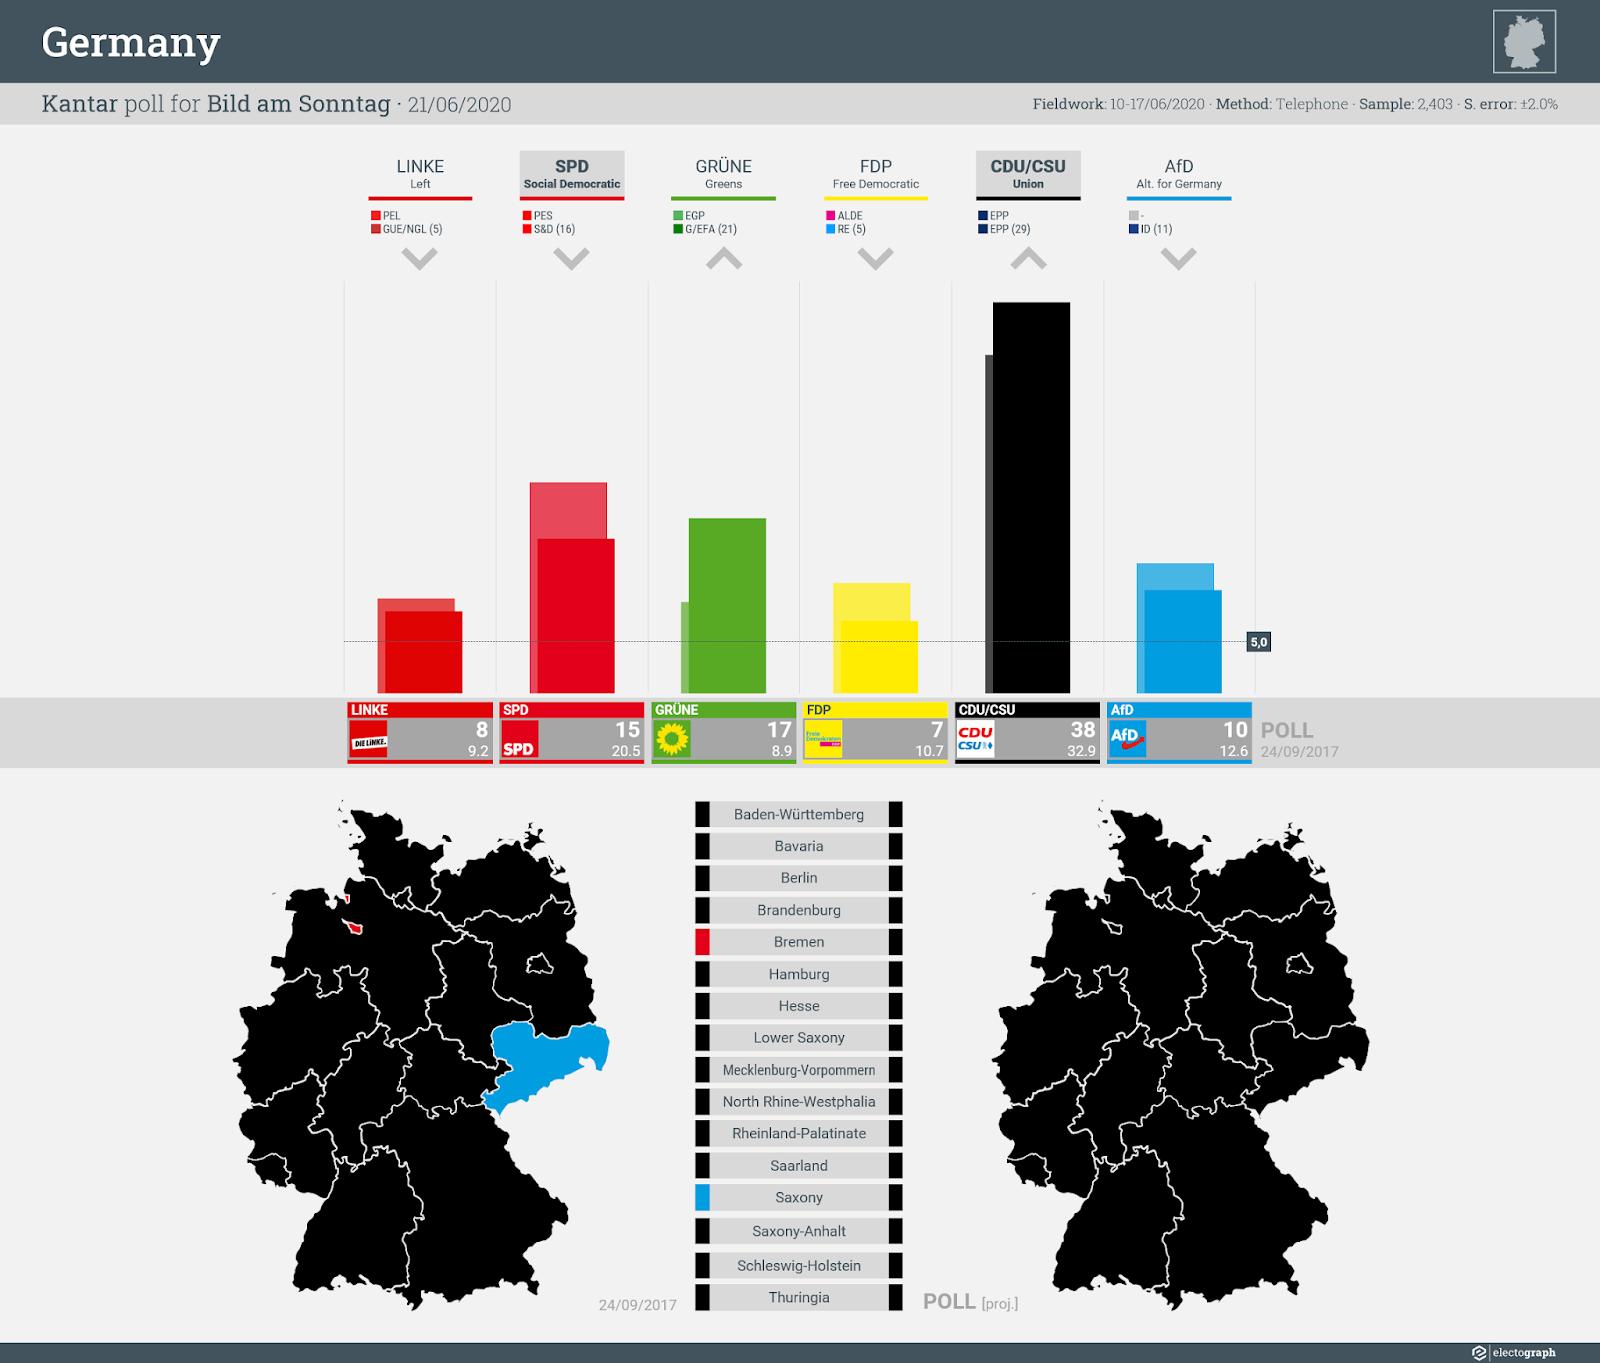 GERMANY: Kantar poll chart for Bild am Sonntag, 21 June 2020